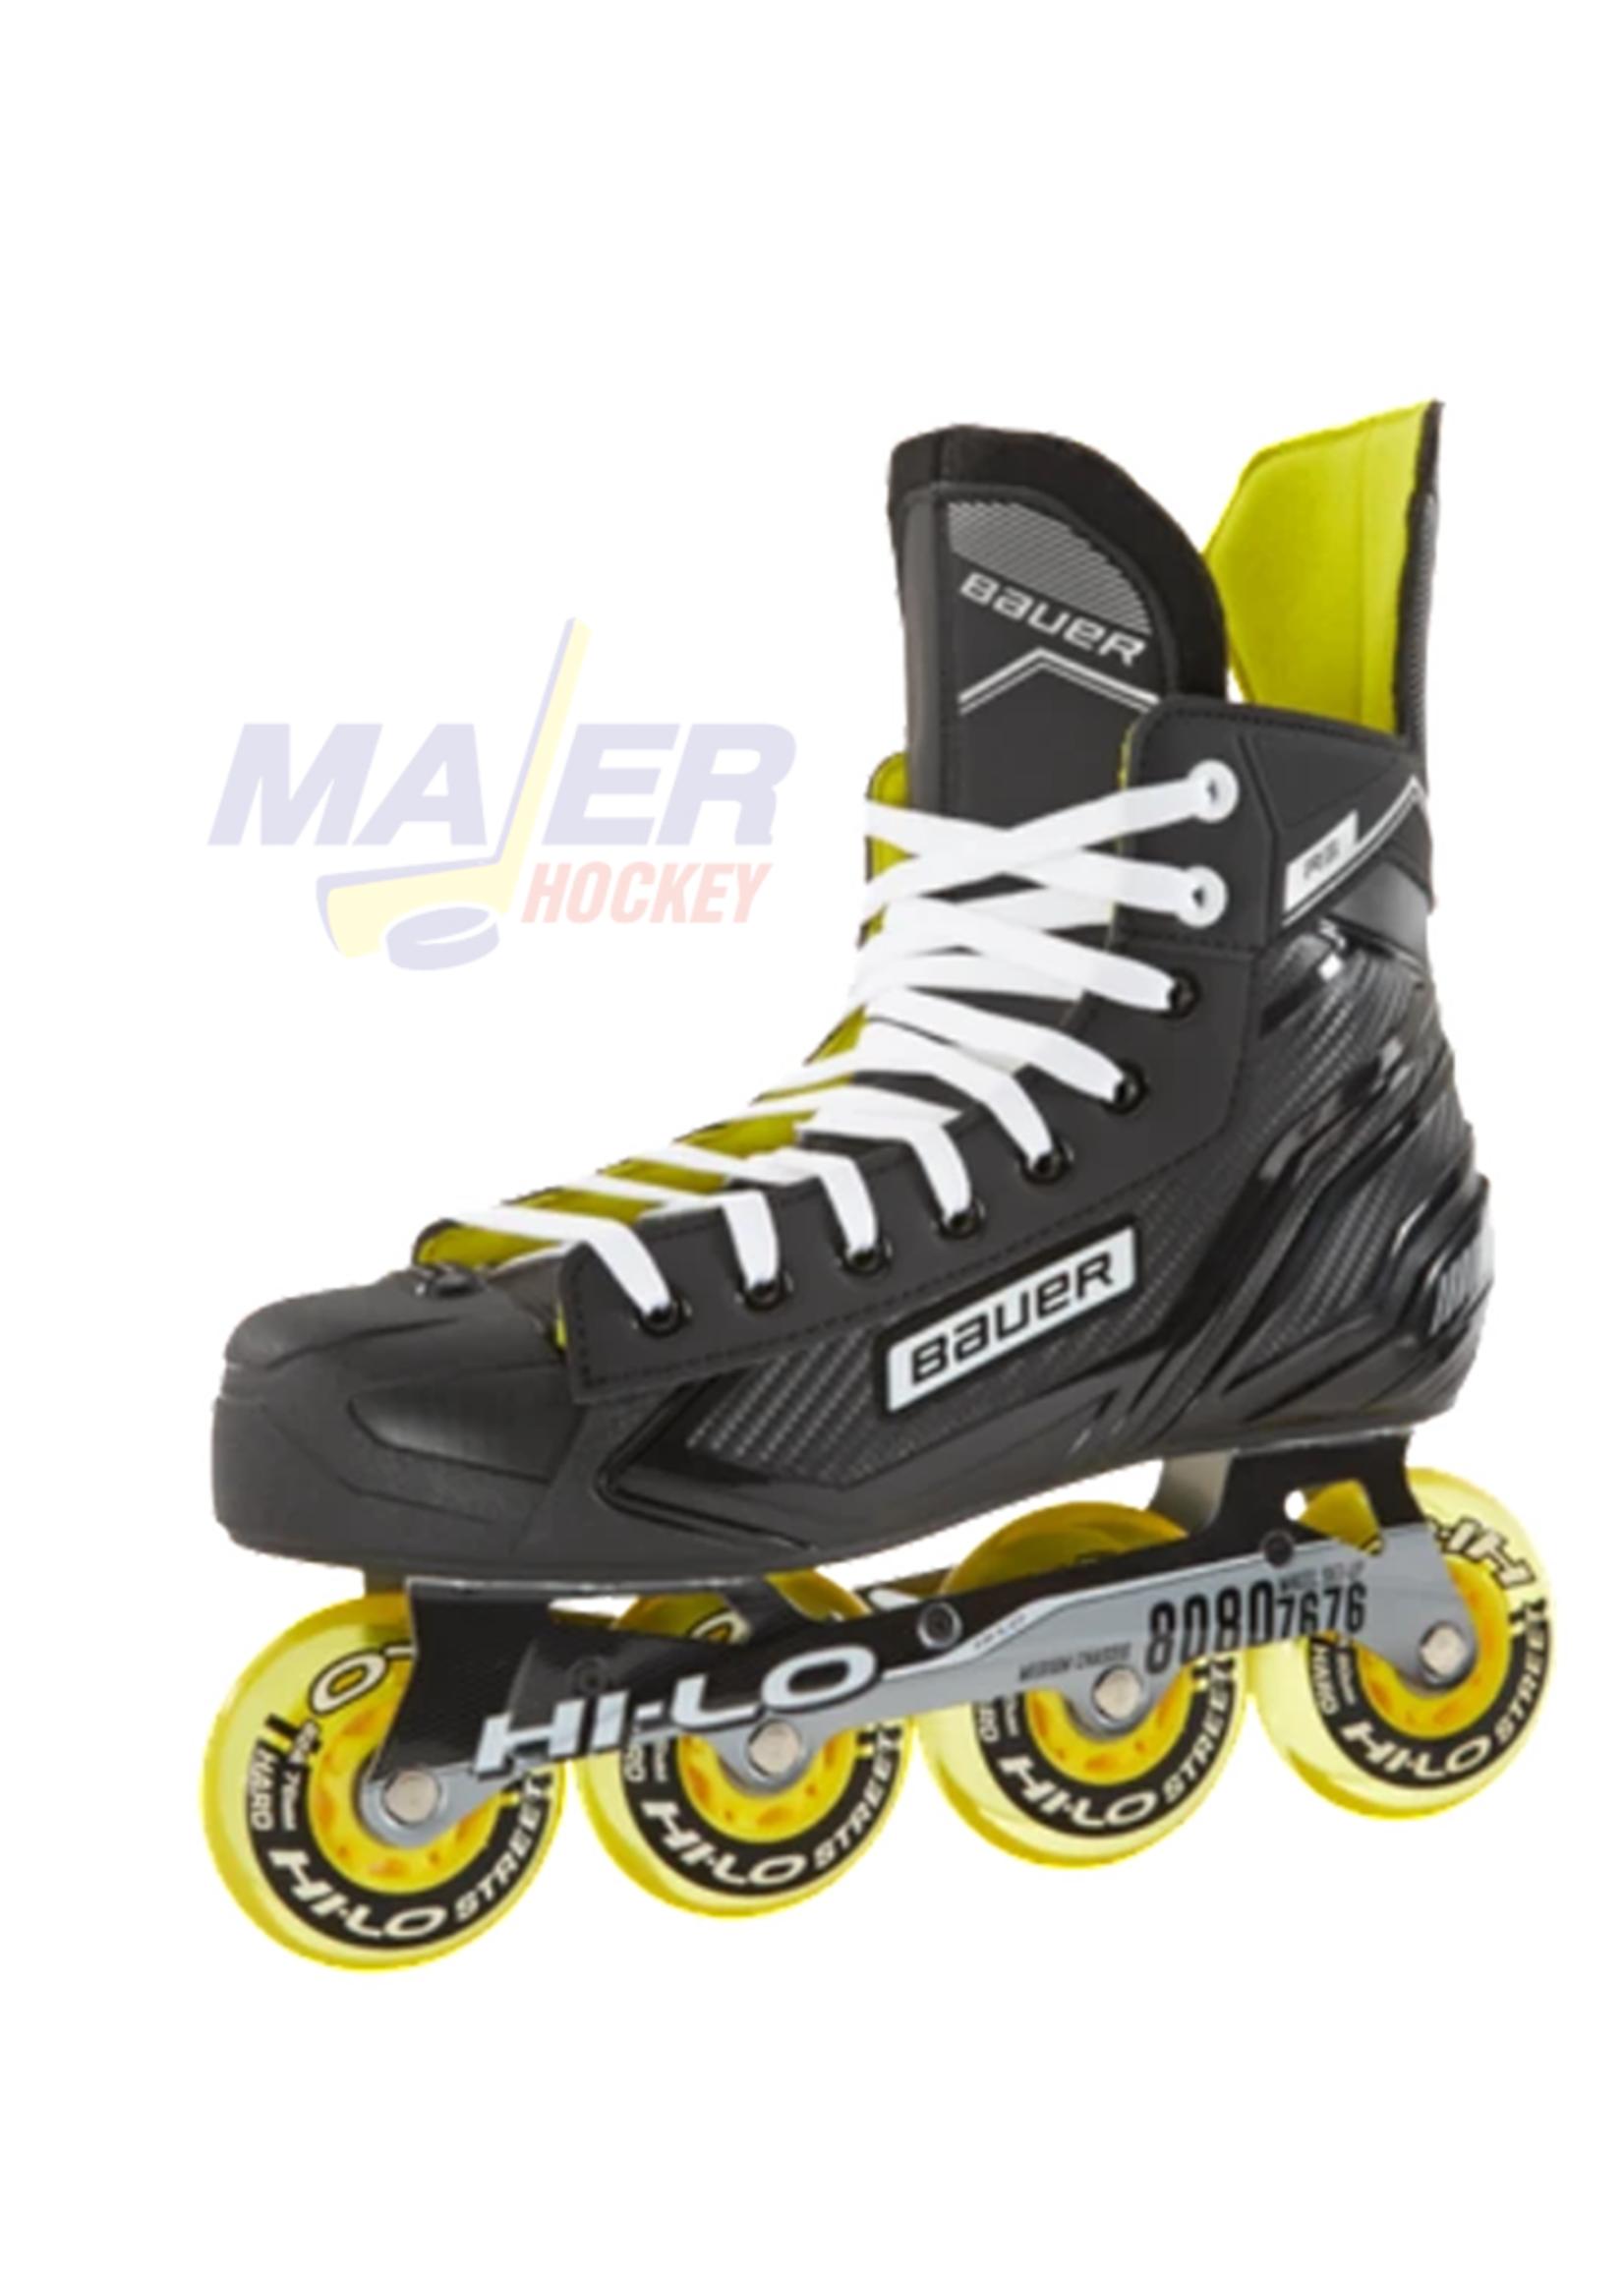 Bauer RH RS Yth Inline Hockey Skates